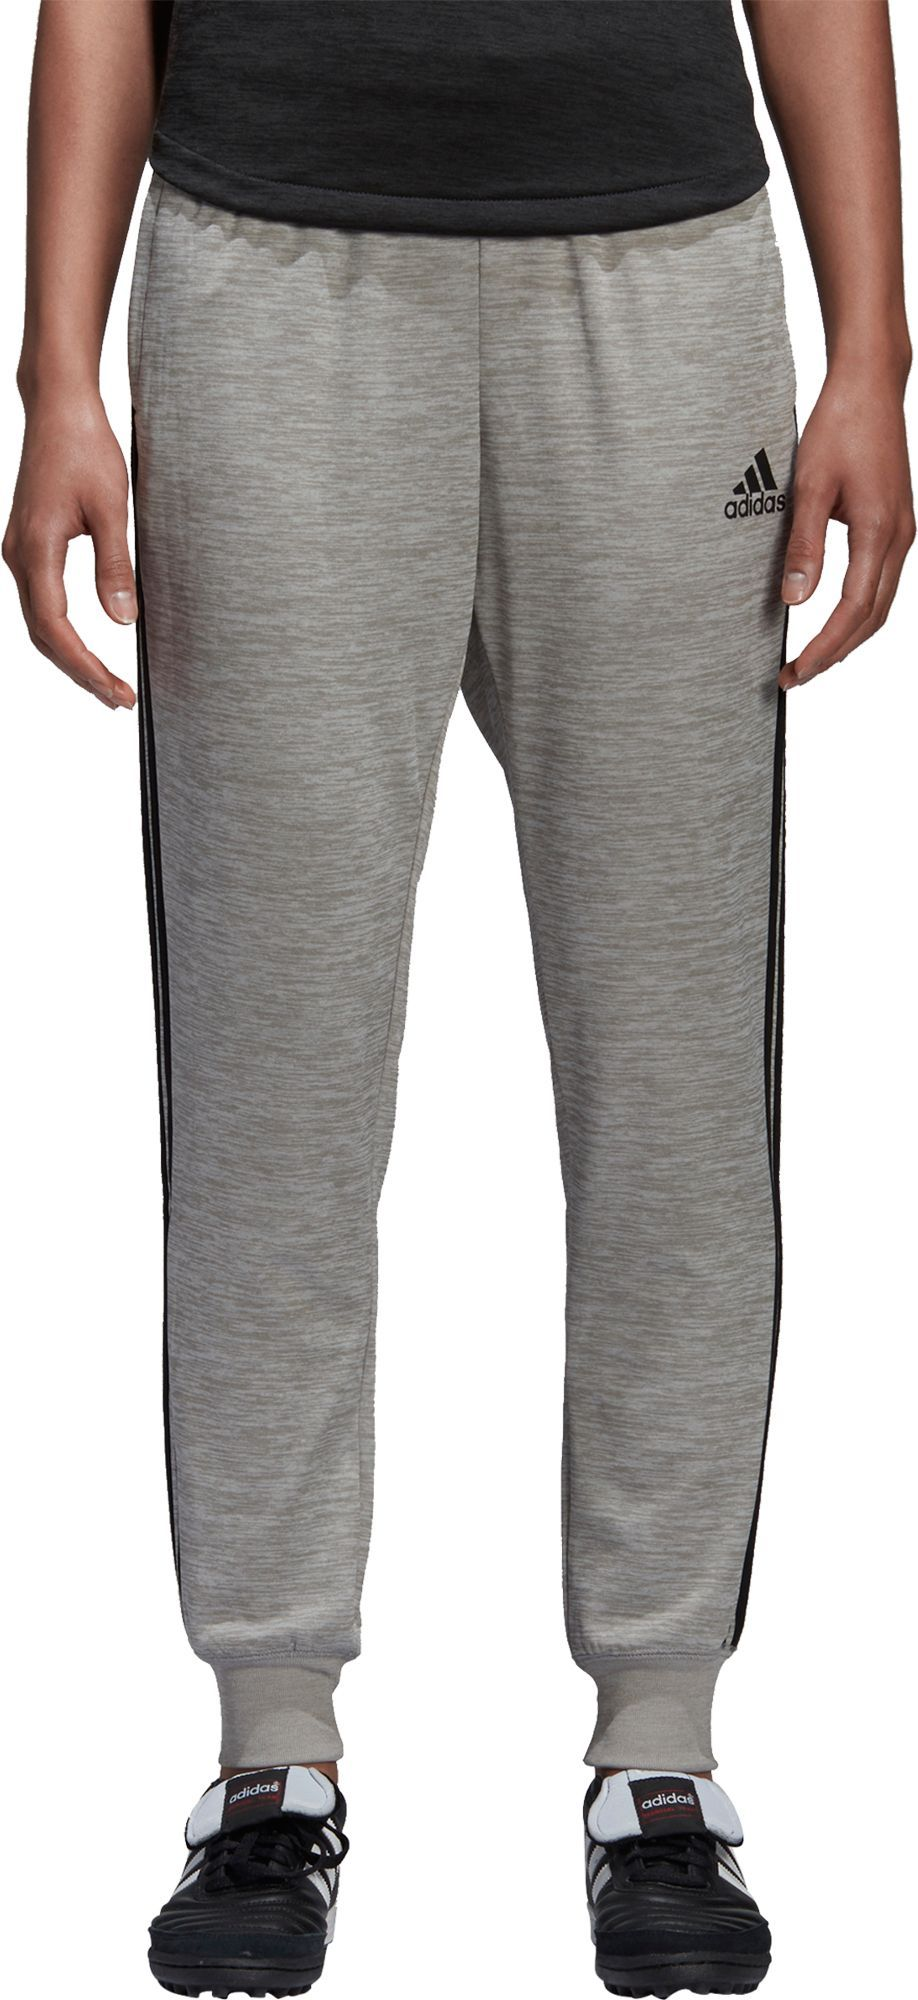 adidas Women's Tango Terry Pants, Gray Adidas women